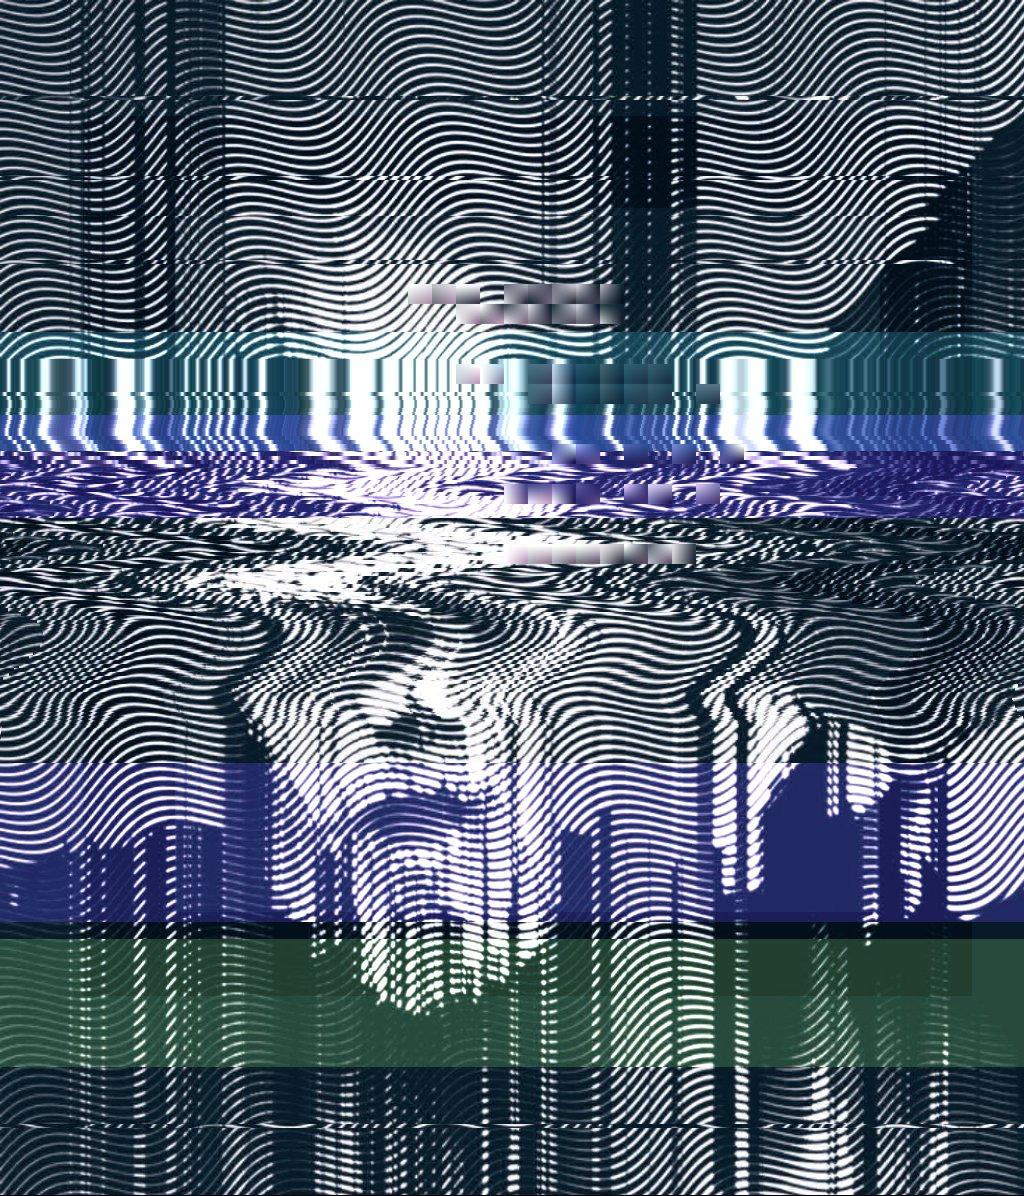 😓🔕 glitch line noir cyberpunk plotter monochrome halftone nodejs Origin img by @KnownOrigin_io